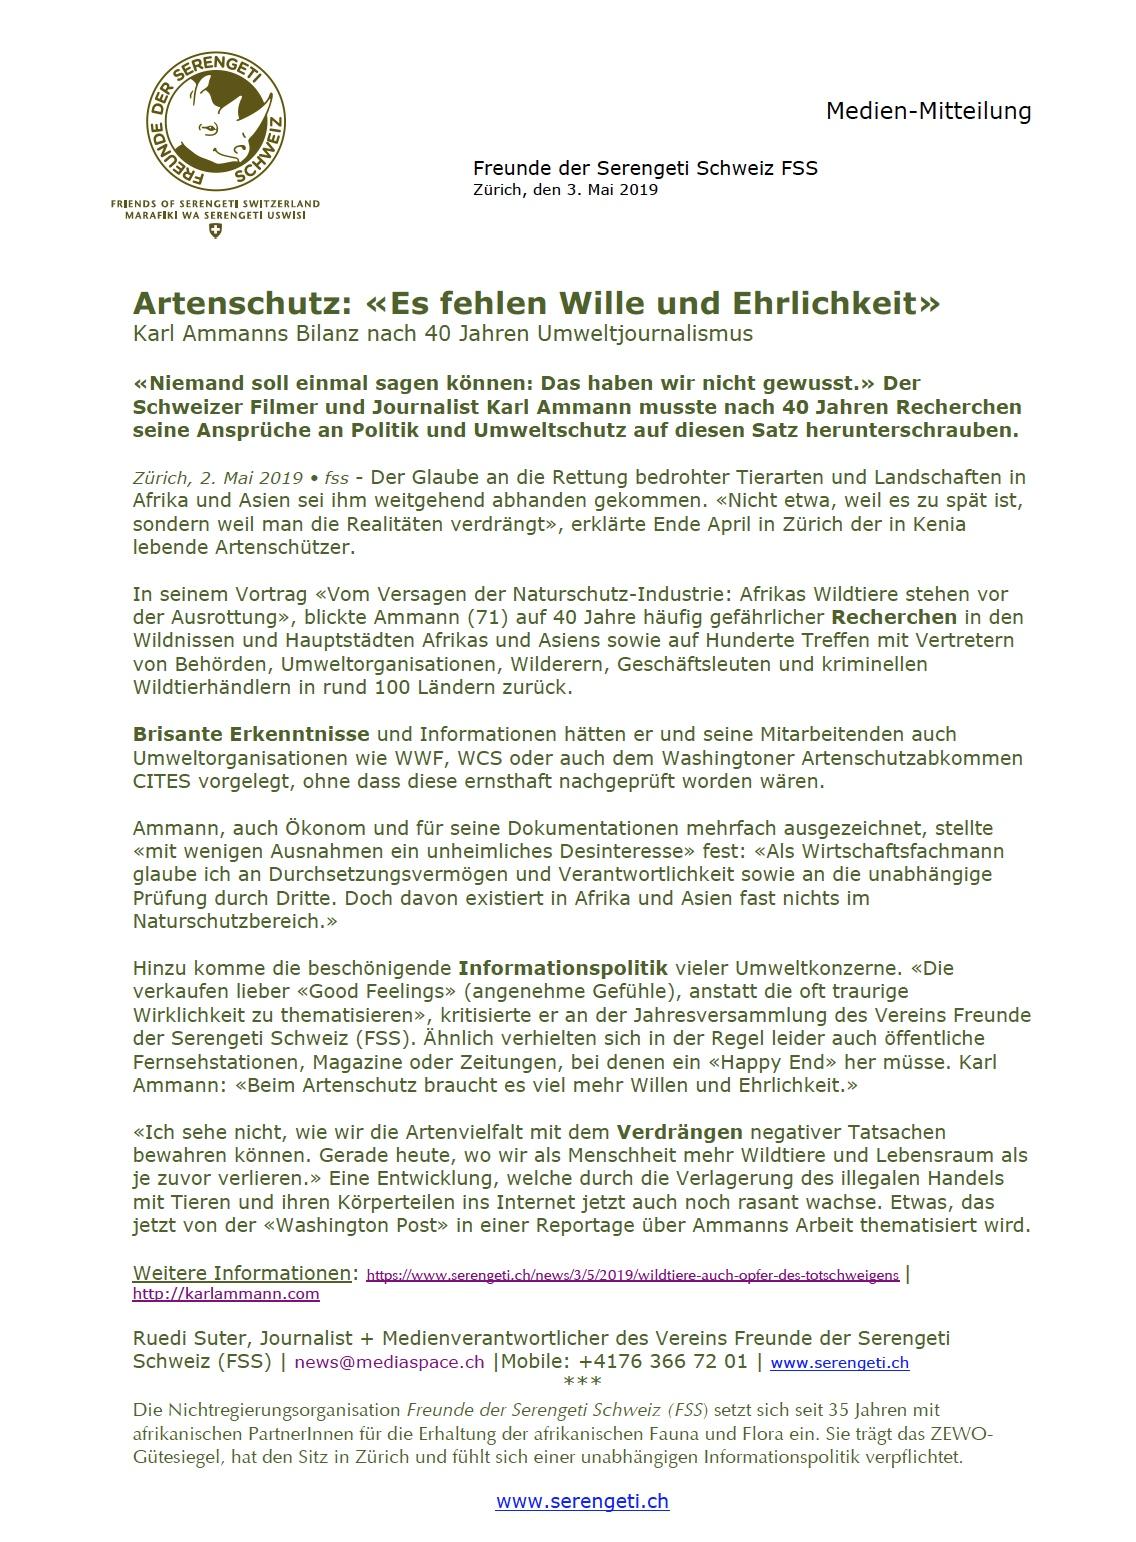 Verdrängte Artenschutzprobleme |Medienmitteilung FSS 2.5.19.jpg